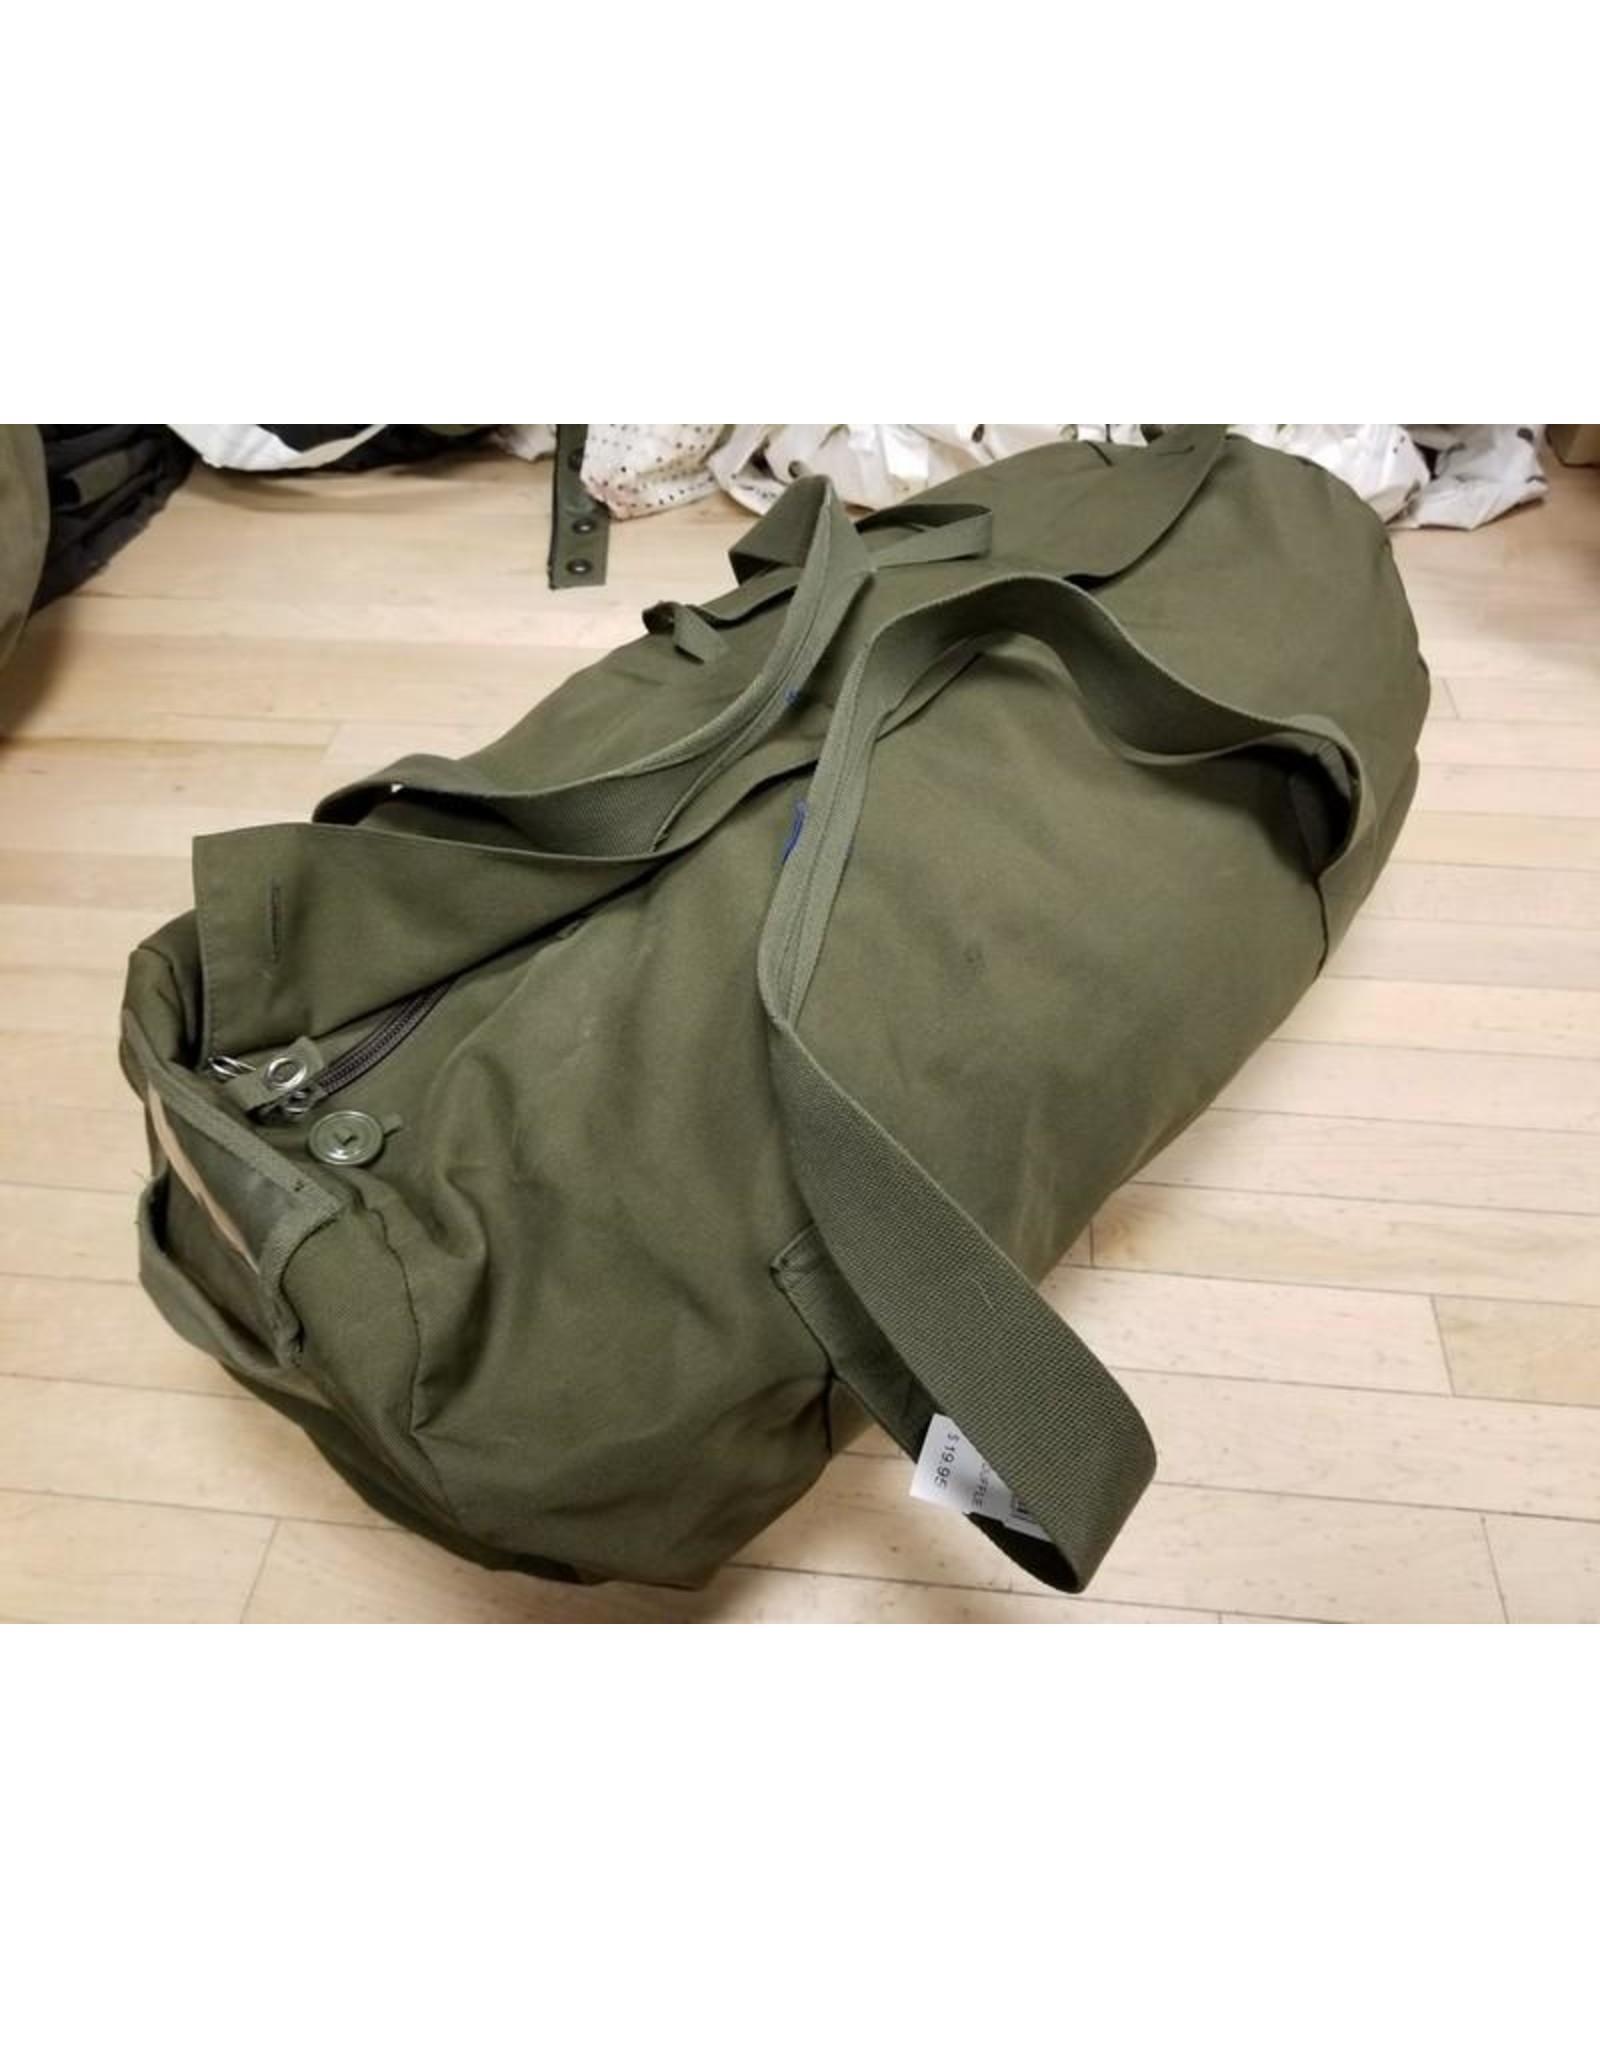 Canadian Olive Duffle bag